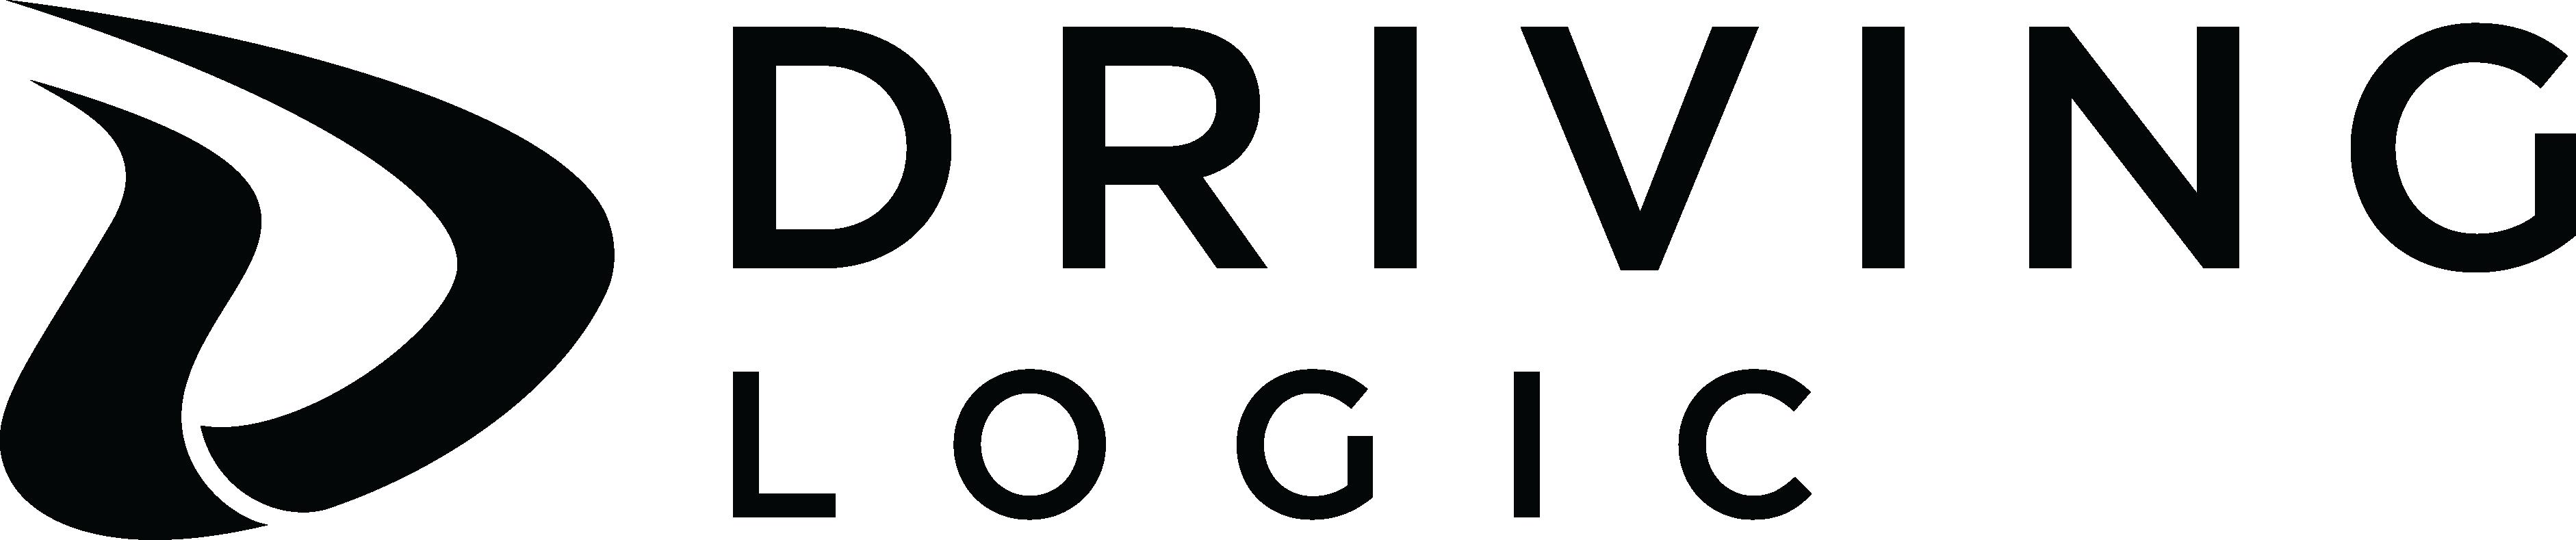 Design a memorable Brand/Logo for a driving ecourse provider